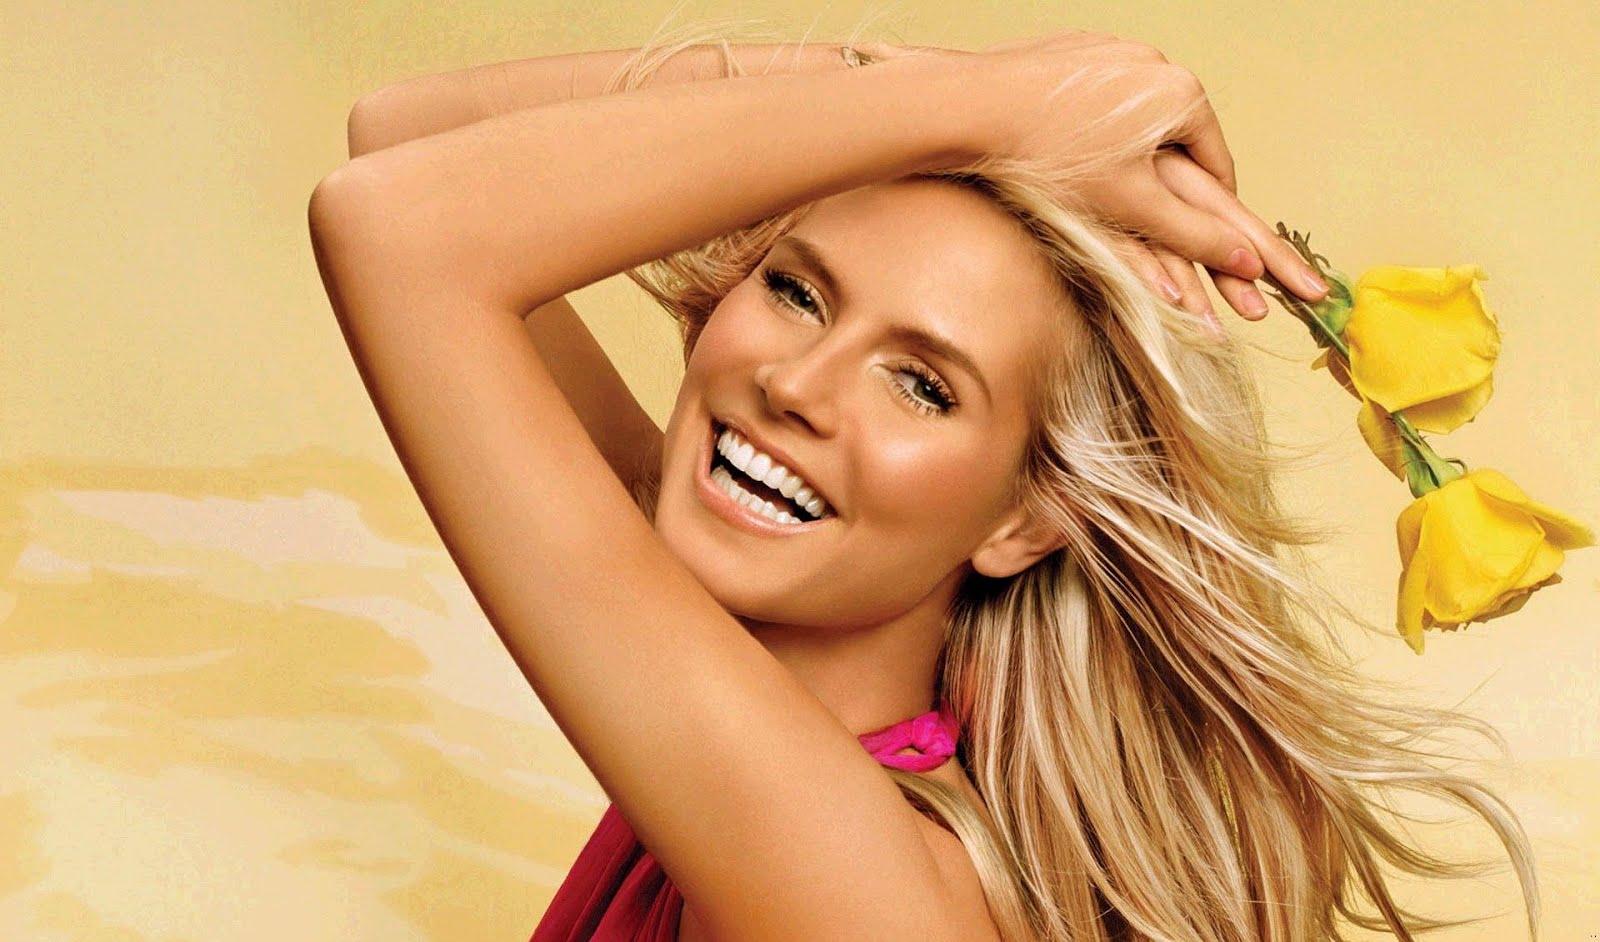 Heidi Klum: Heidi Klum Victoria Secret Model Wallpapers